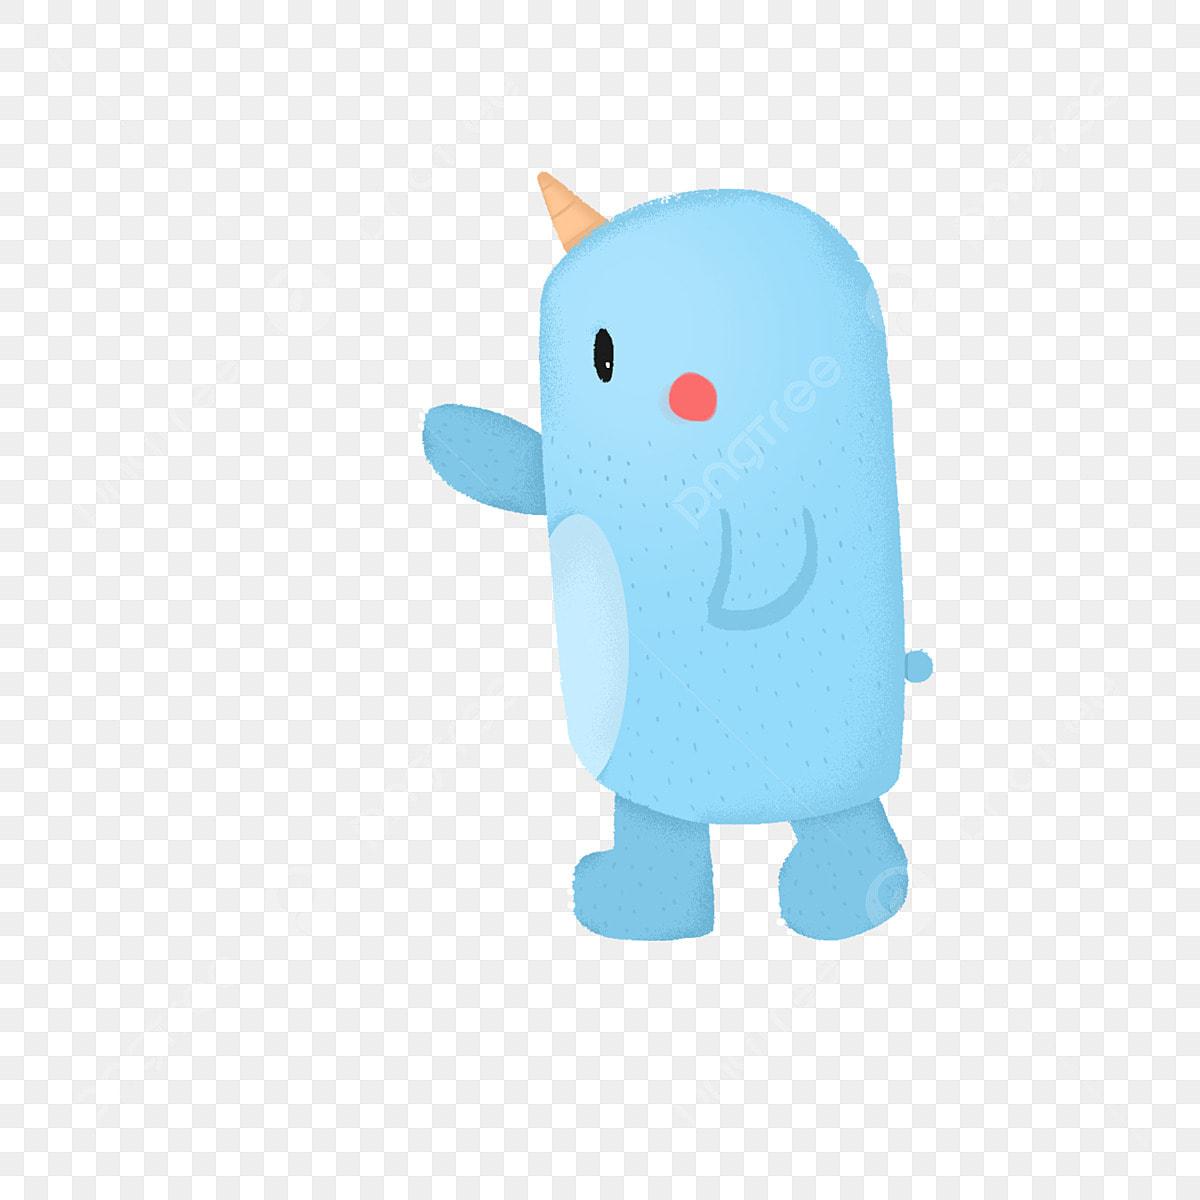 Dessin Anime Animal Animal Bleu Schtroumpf Bleu Illustration